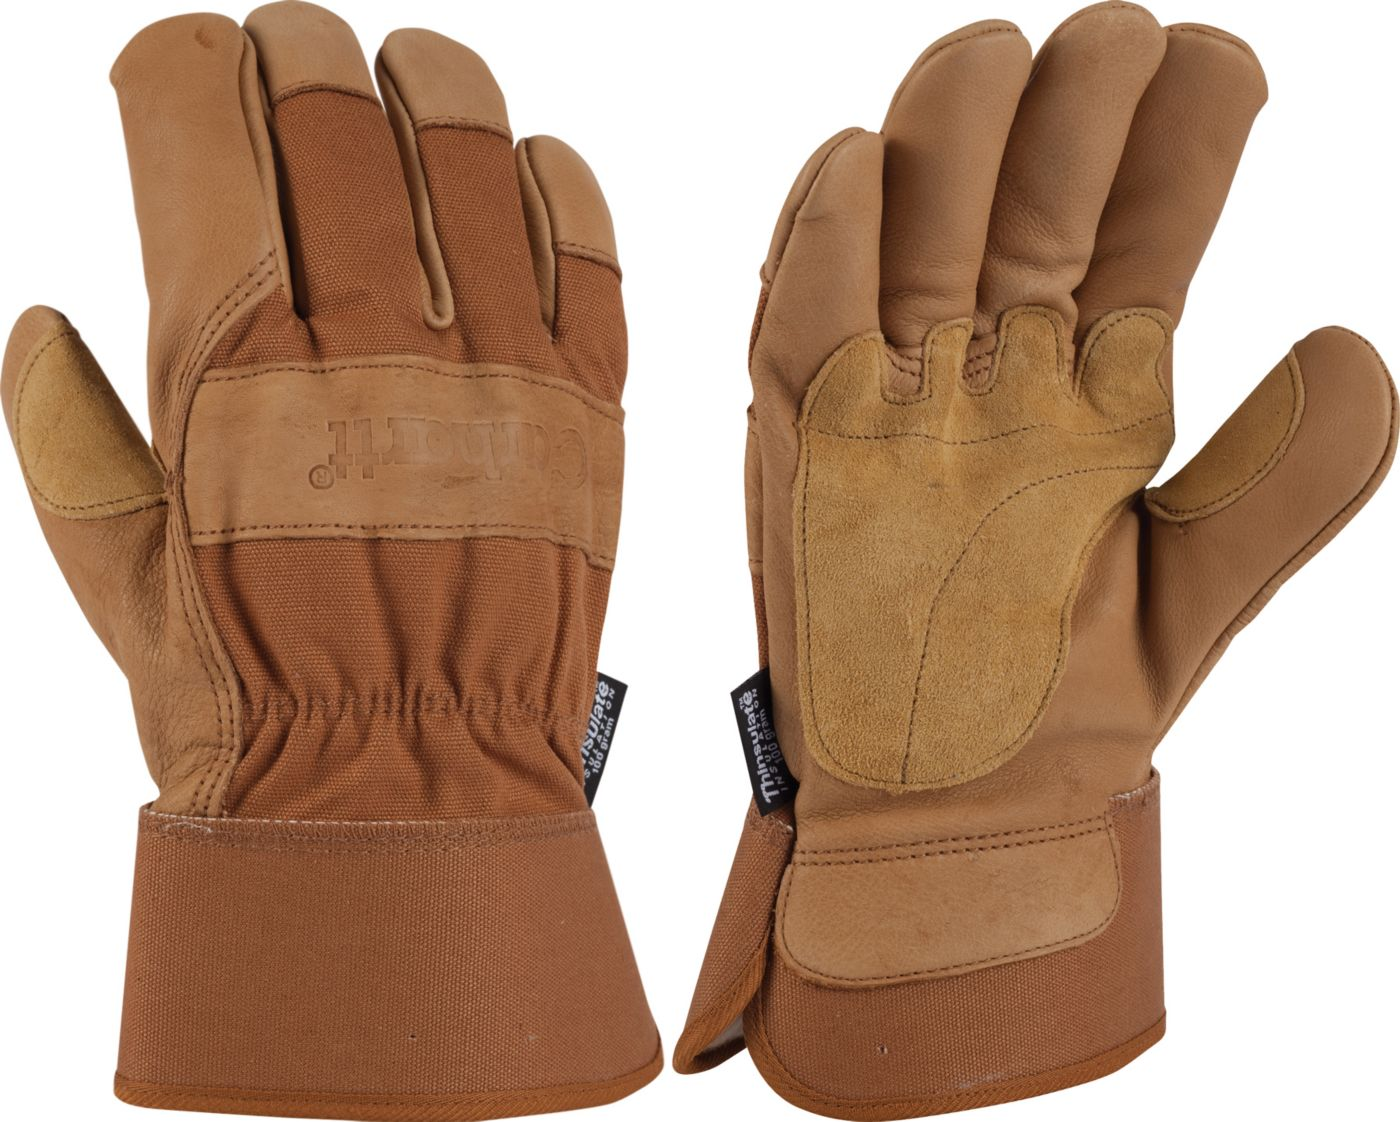 Carhartt Men's Insulated Grain Gloves